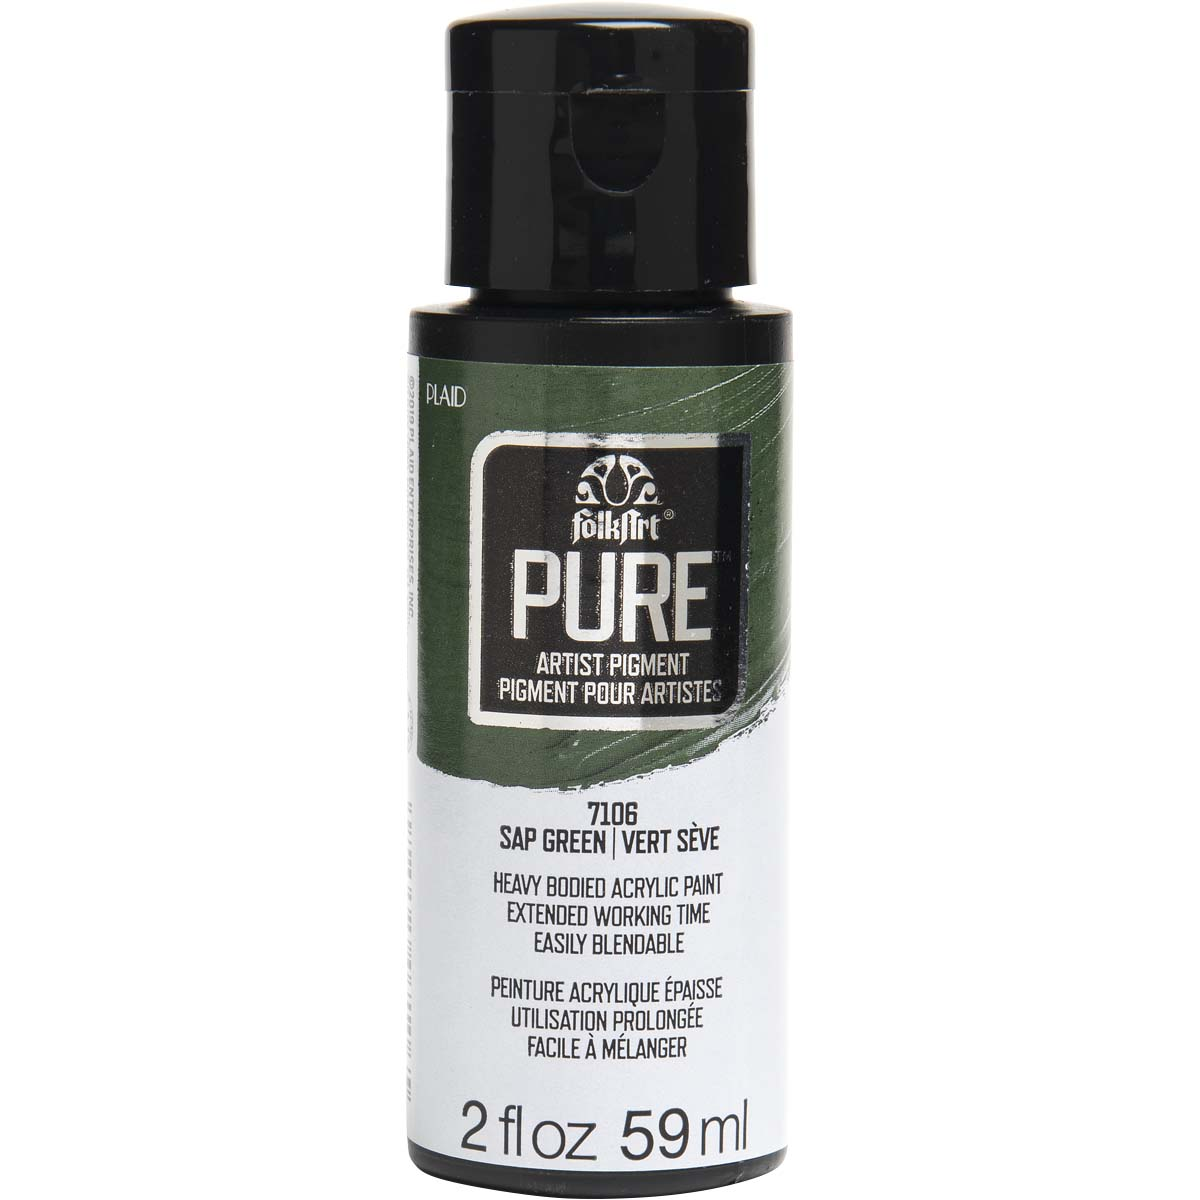 FolkArt ® Pure™ Artist Pigment - Sap Green, 2 oz. - 7106